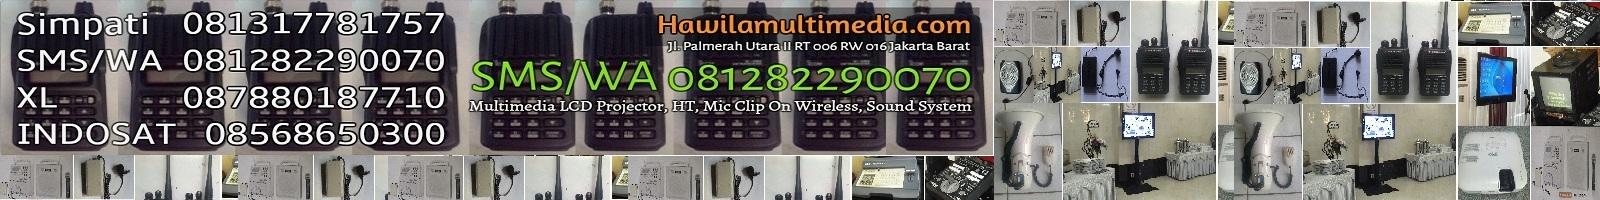 Sewa Speaker Toa Rental Portable Wireless Amplifier Di DKI Jakarta & Sekitarnya